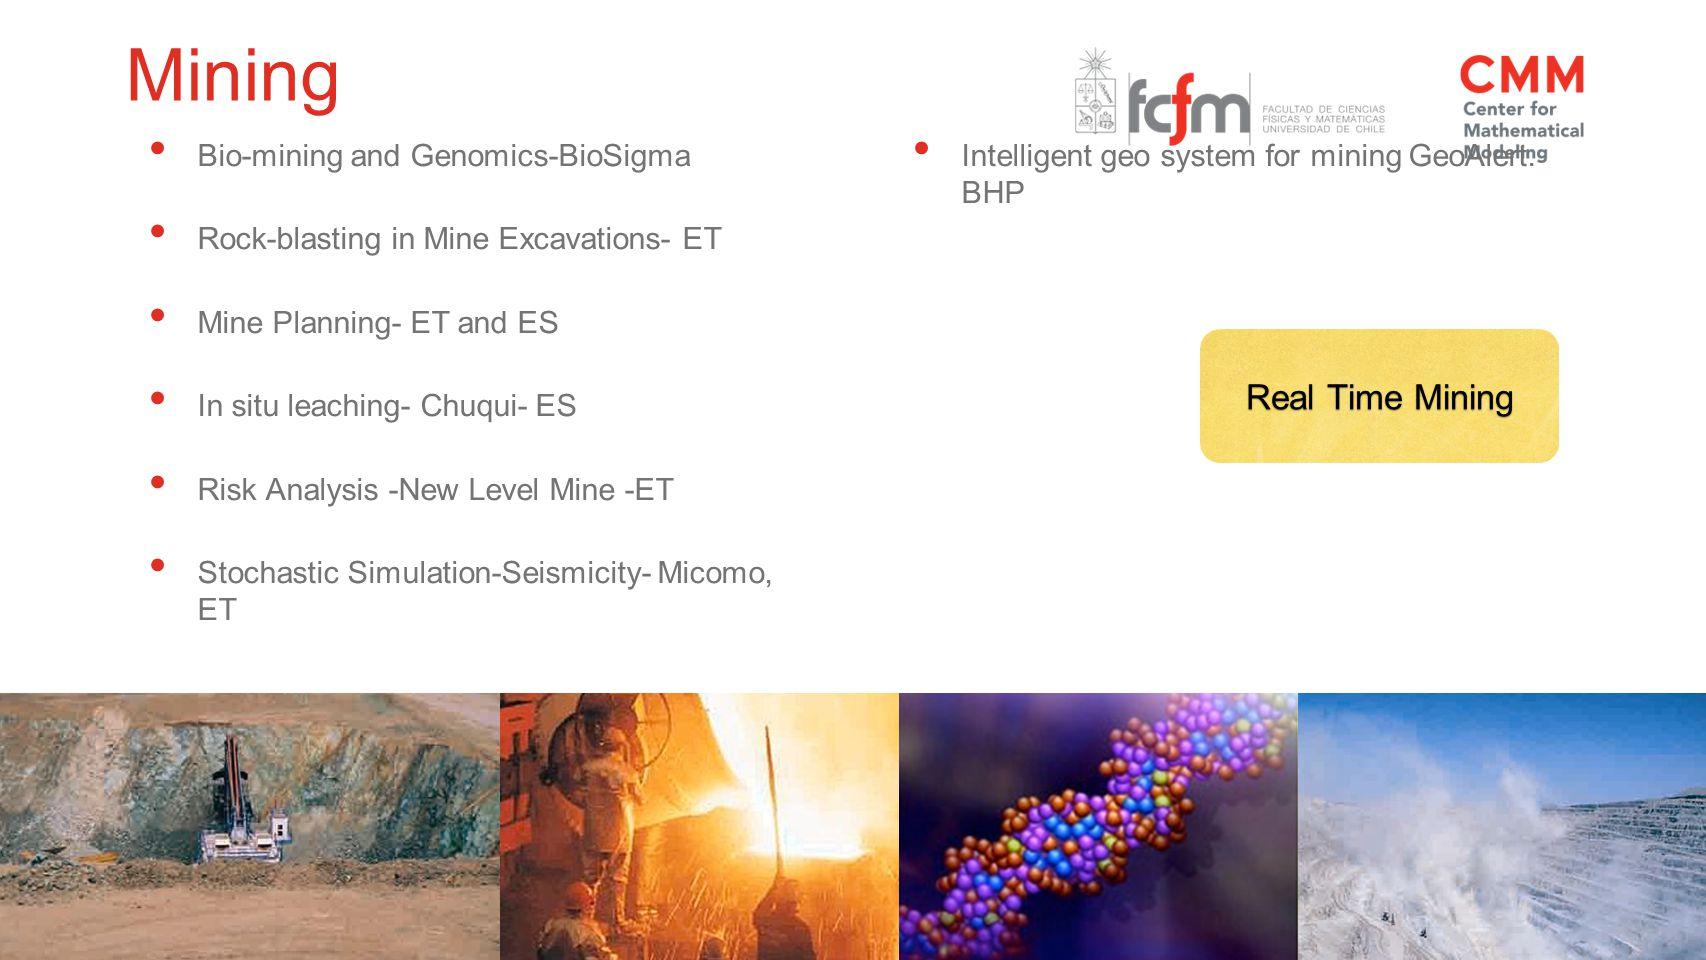 Bio-mining and Genomics-BioSigma Rock-blasting in Mine Excavations- ET Mine Planning- ET and ES In situ leaching- Chuqui- ES Risk Analysis -New Level Mine -ET Stochastic Simulation-Seismicity- Micomo, ET Intelligent geo system for mining GeoAlert.